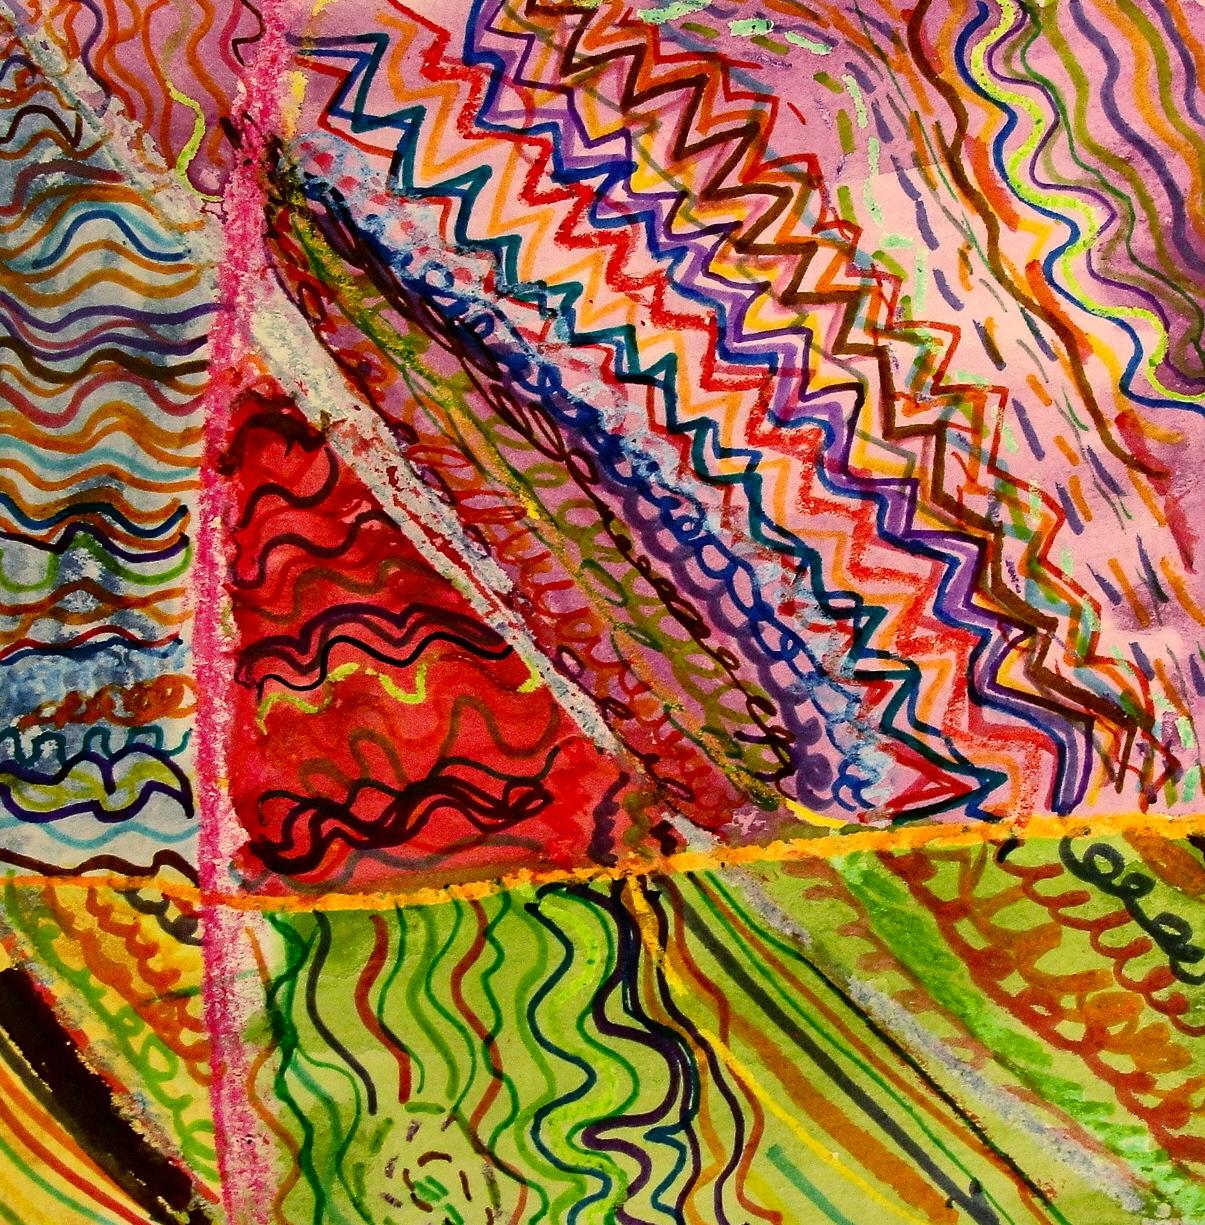 Line Art Vs Painting : Da vinci s wings st grade line paintings square art